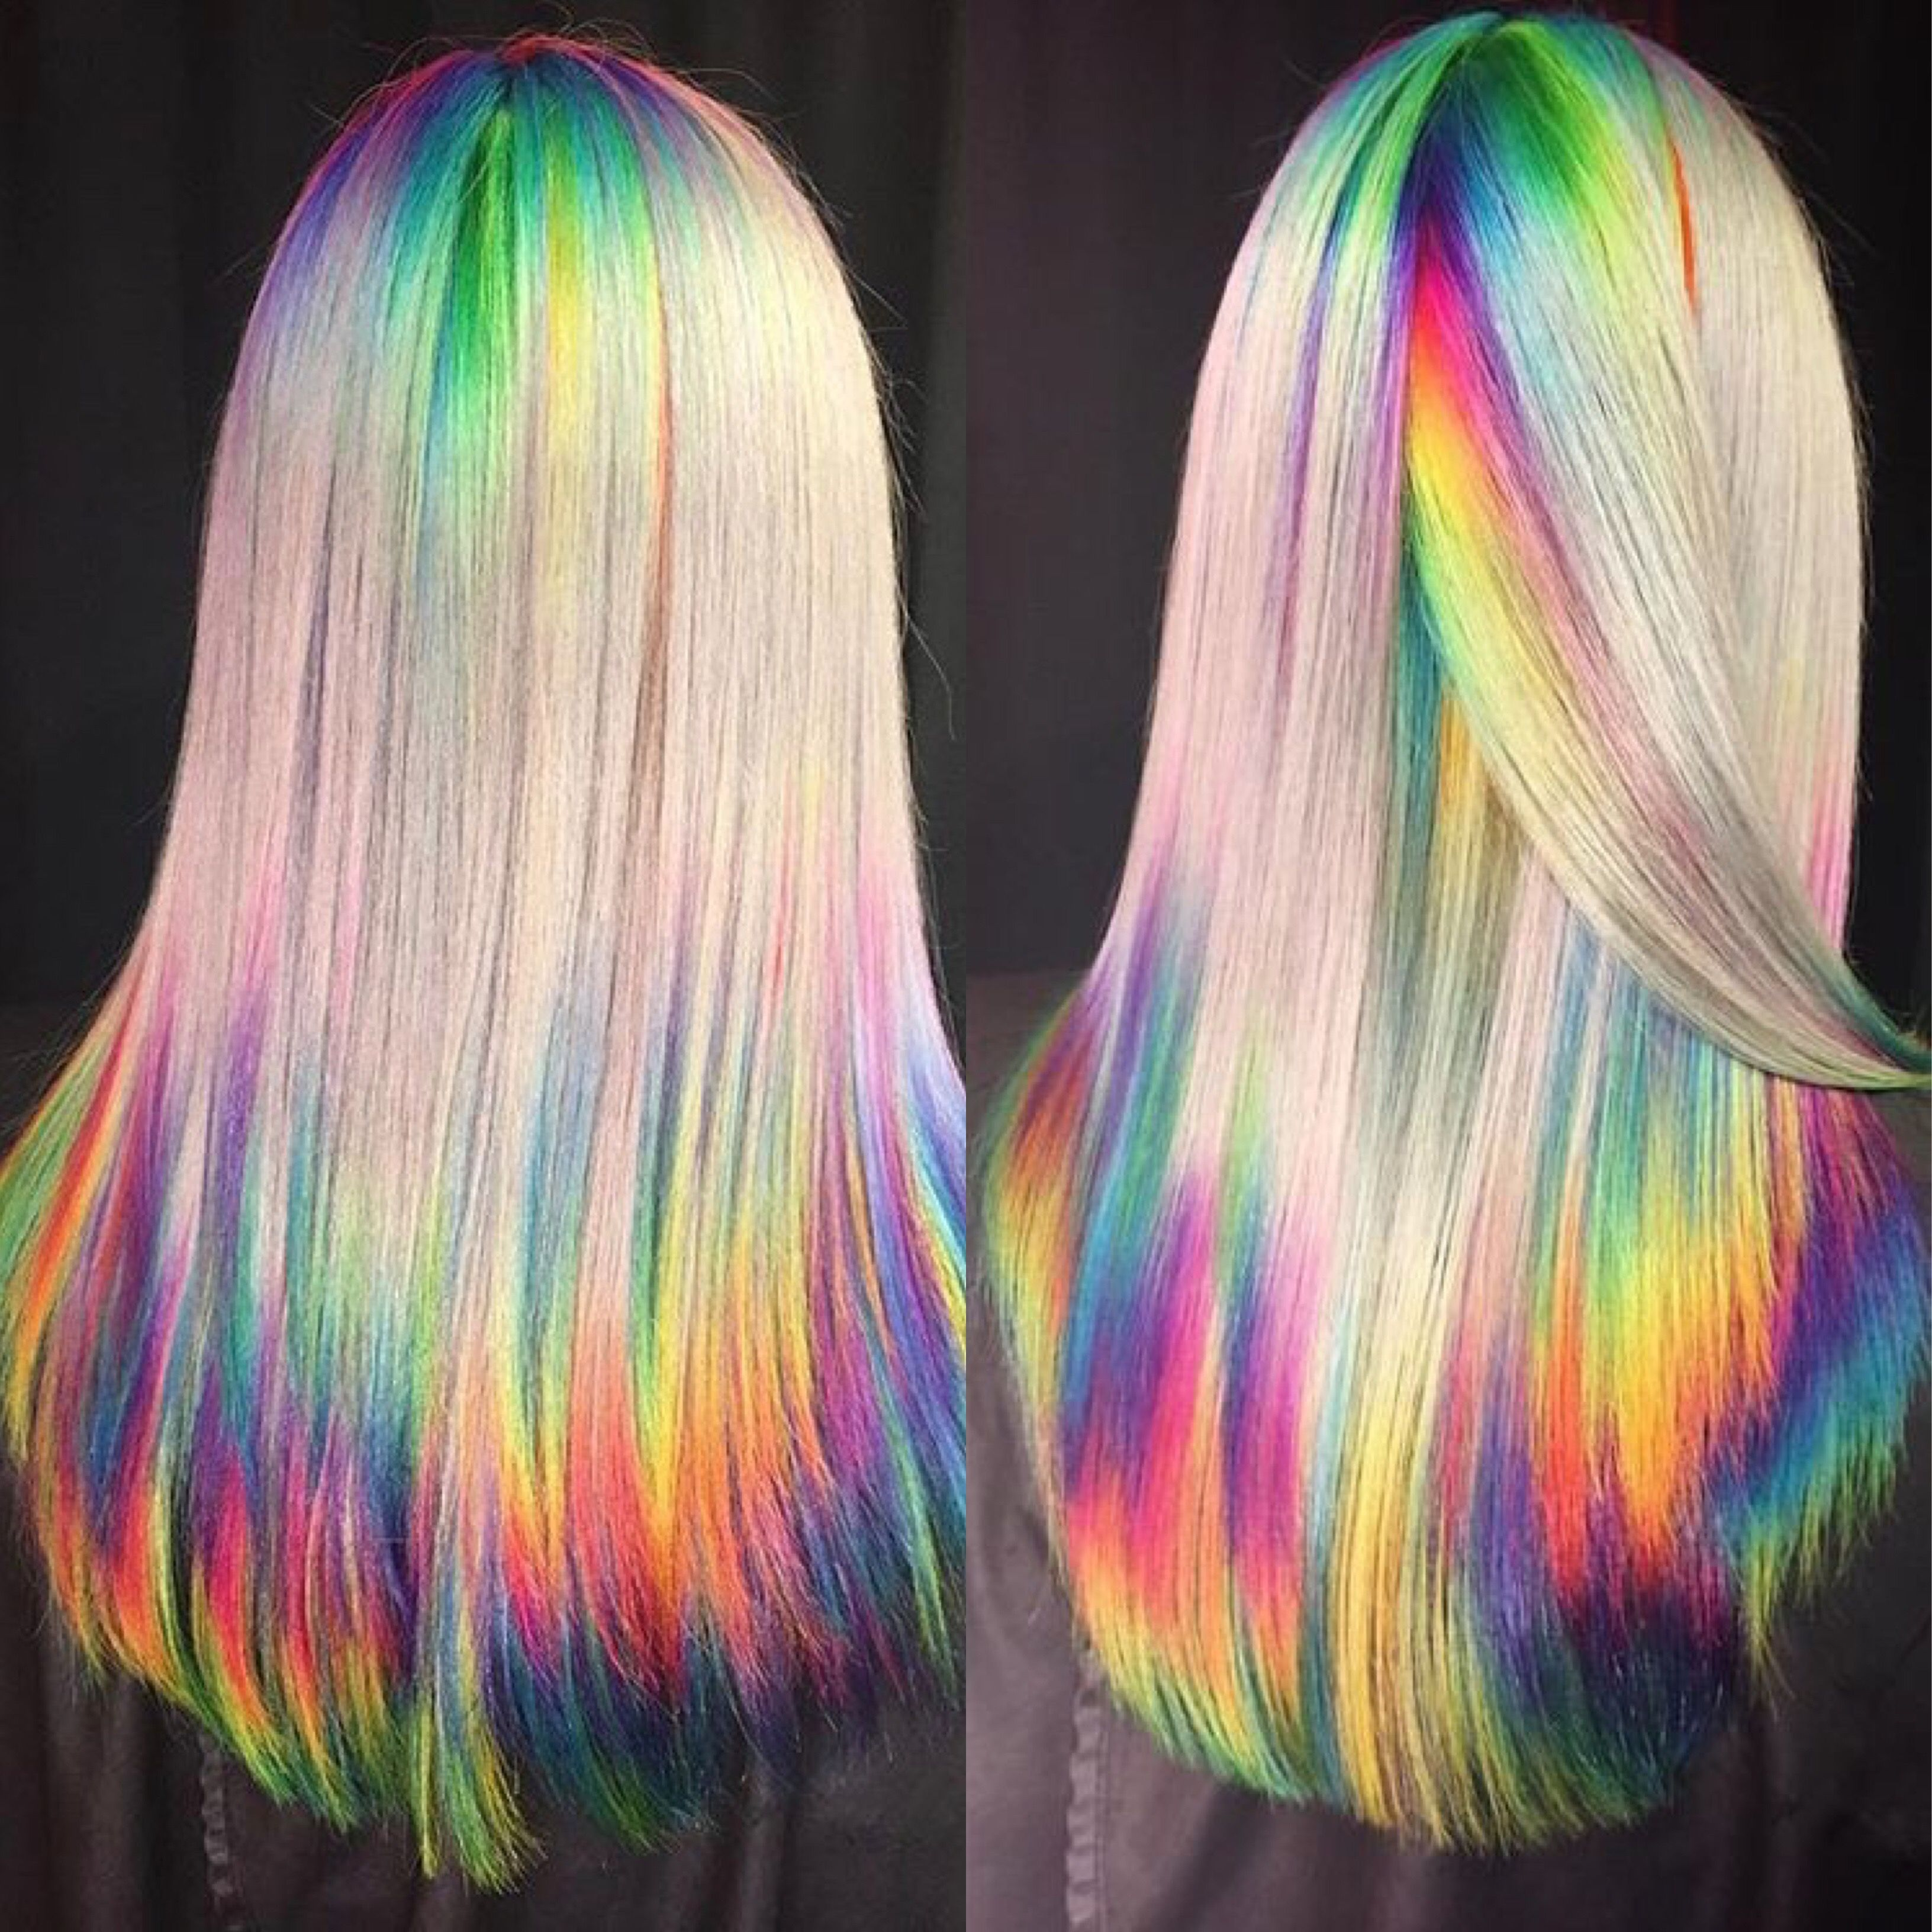 gorgeous shimmer rainbow effect on vanilla hi-lift blonde